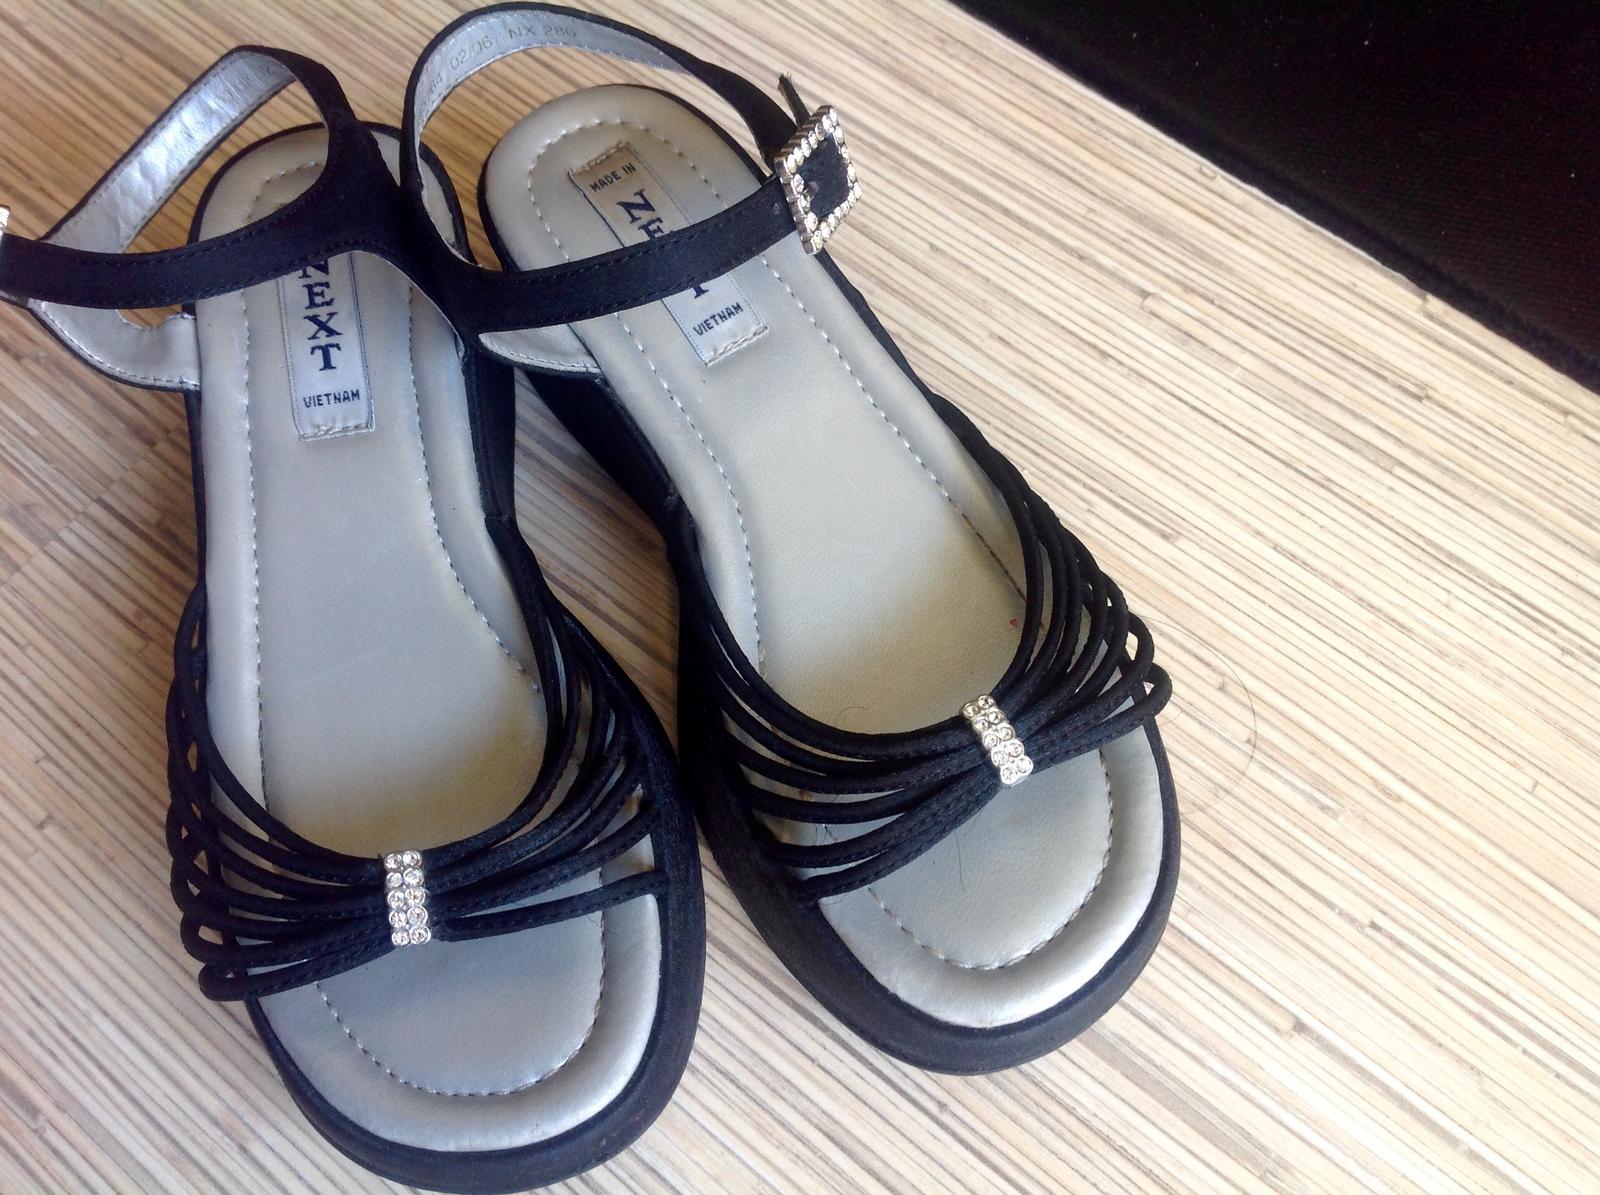 Satenove sandalky next - Obrázok č. 1